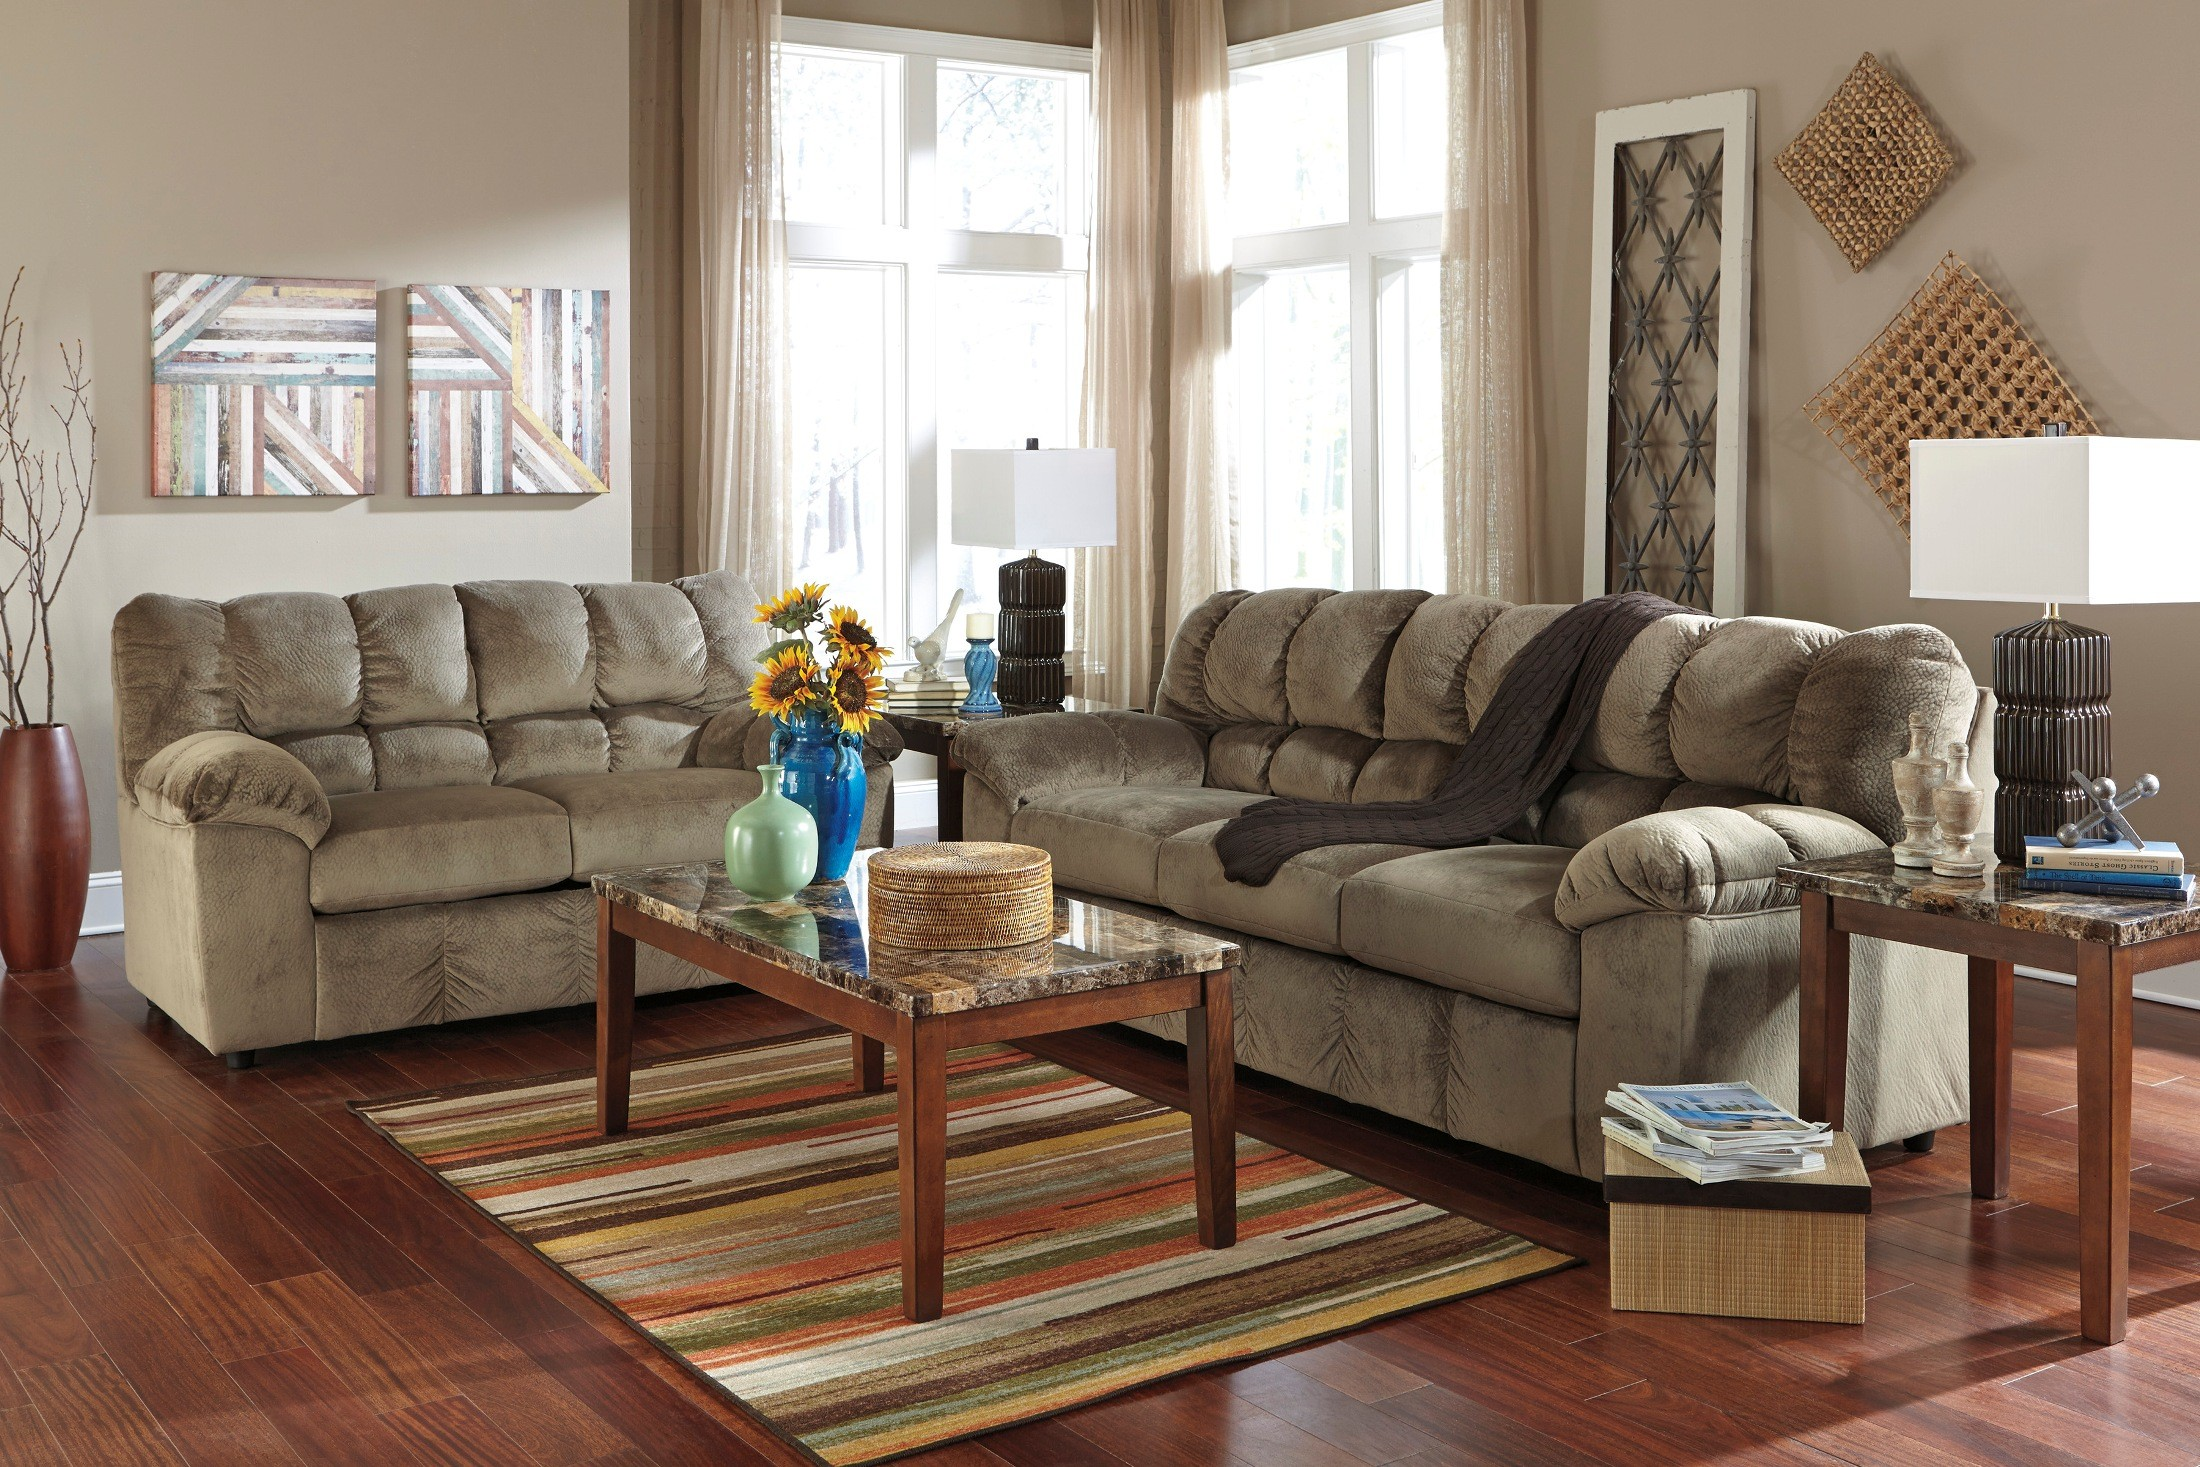 Julson dune living room set from ashley 26601 38 35 - Living room furniture sets ashley ...